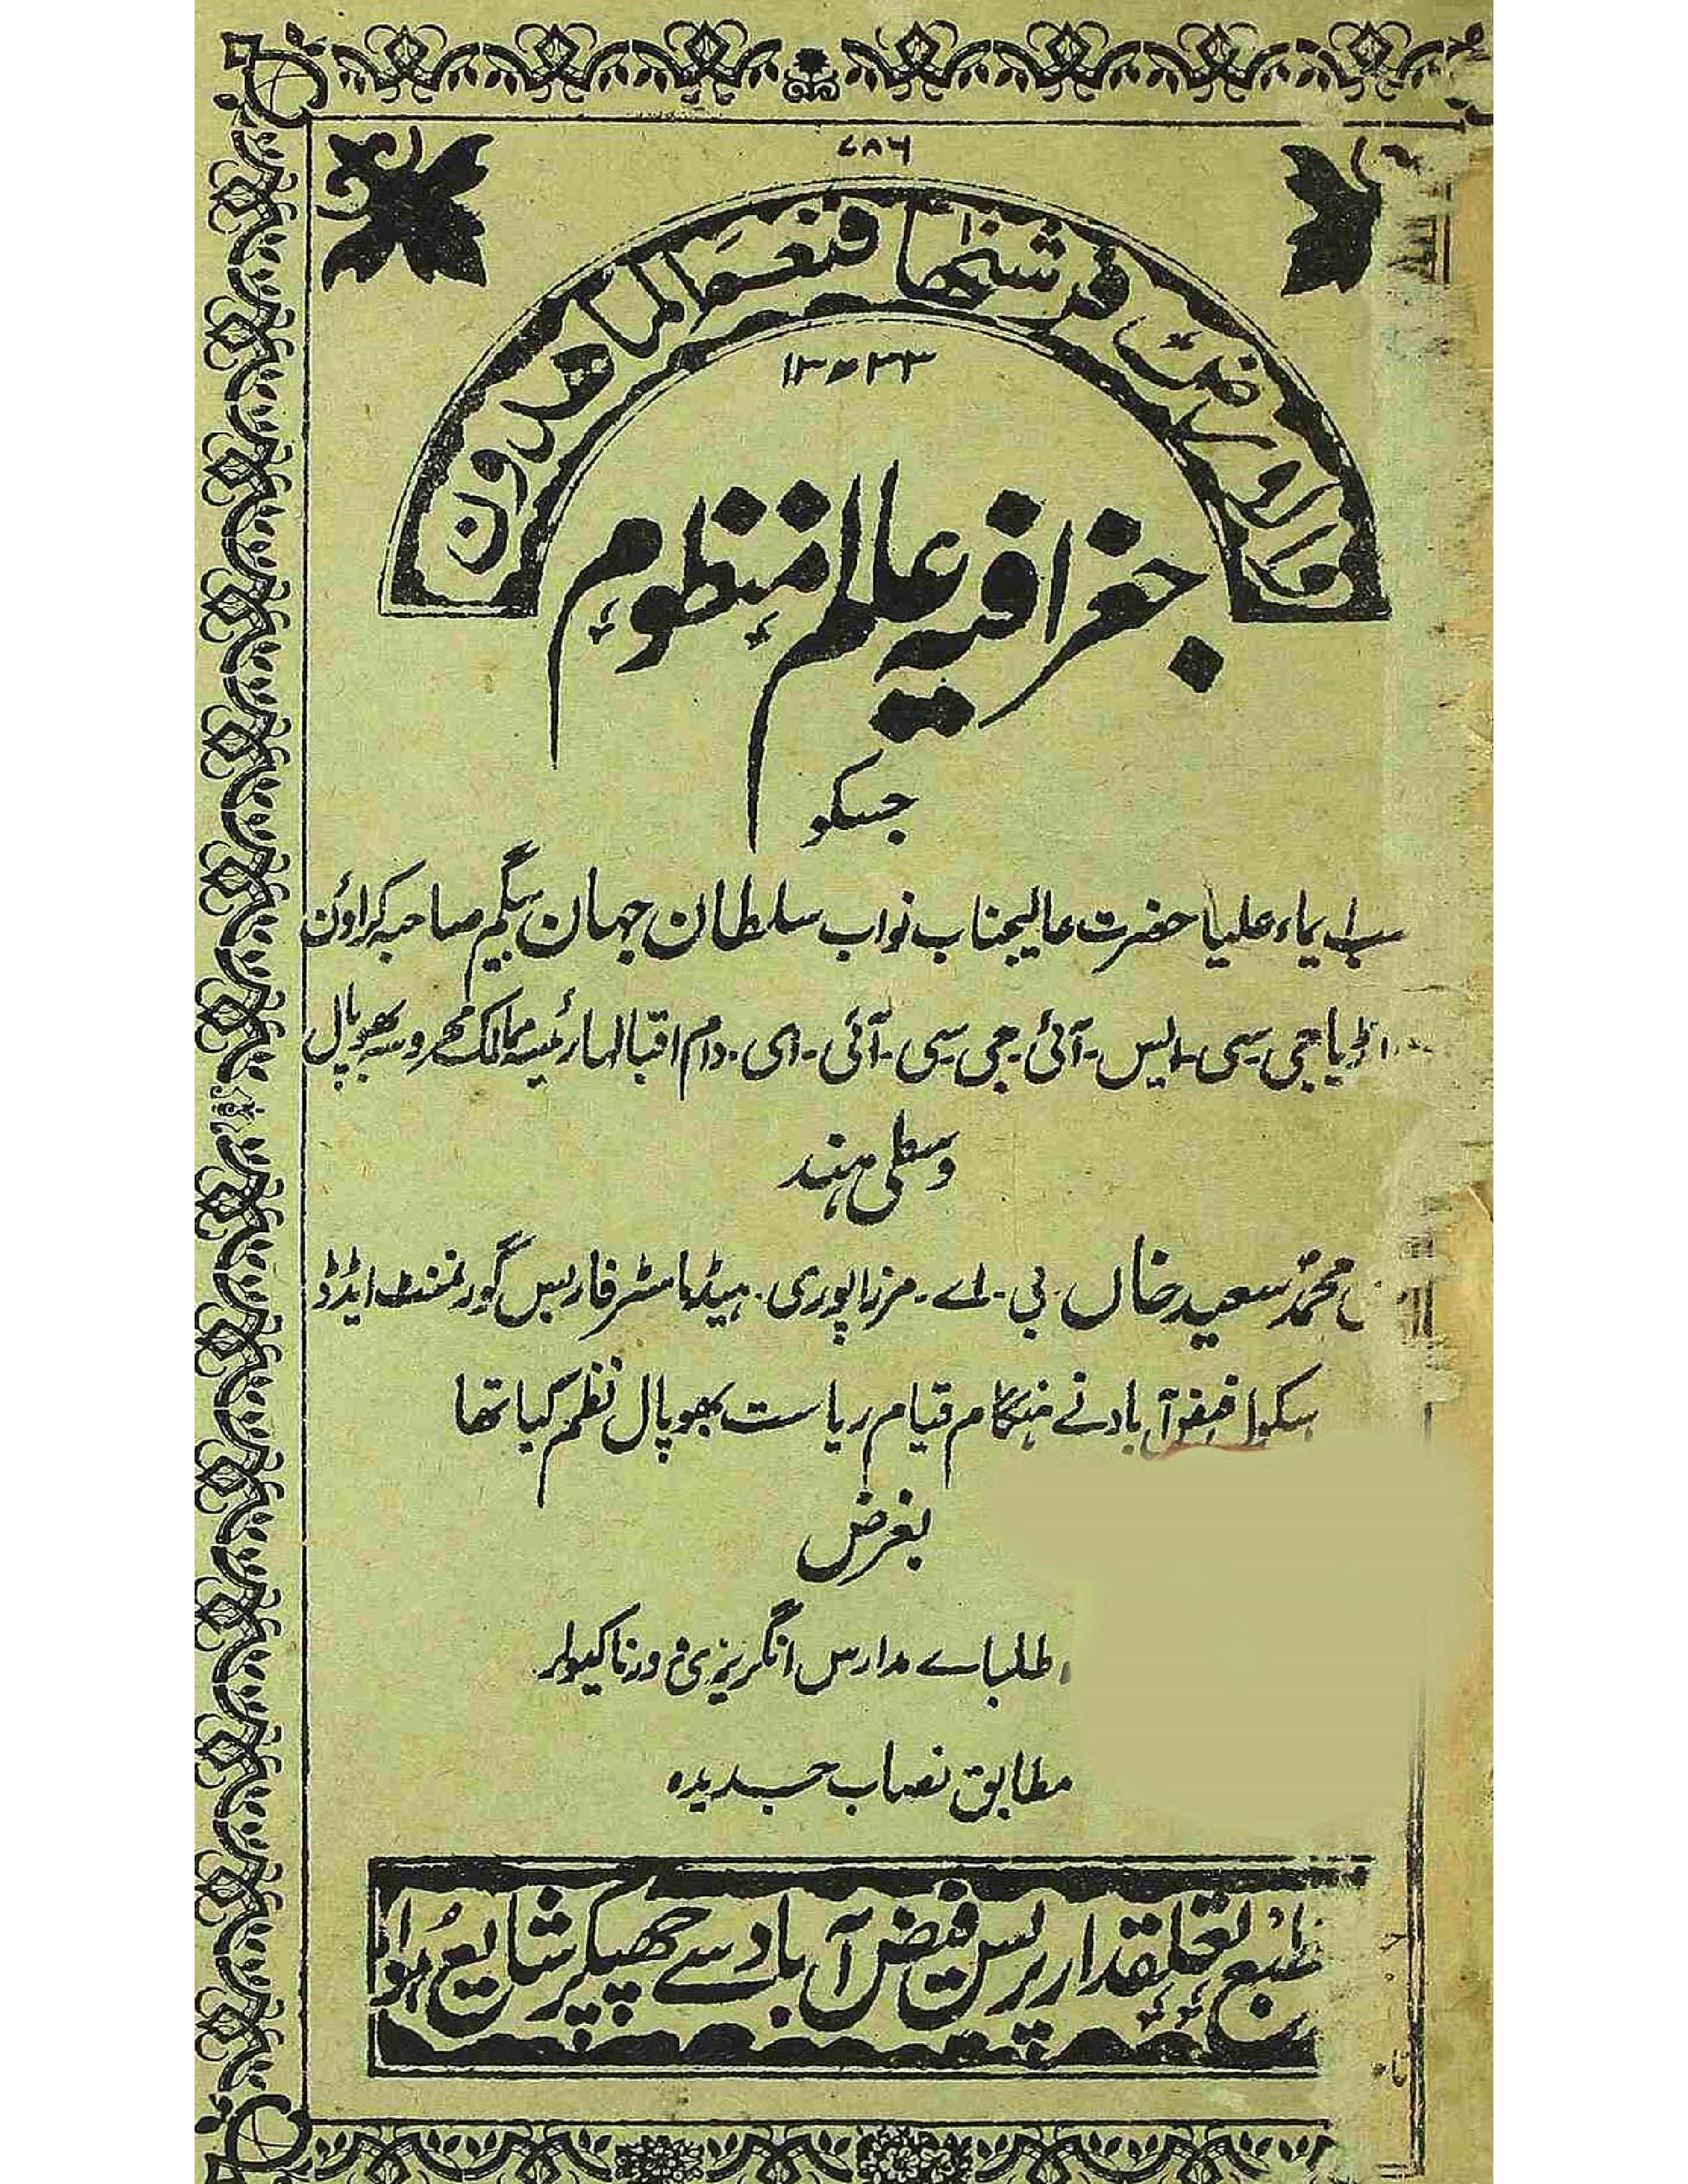 Jughrafiya-e-Alam Manzoom